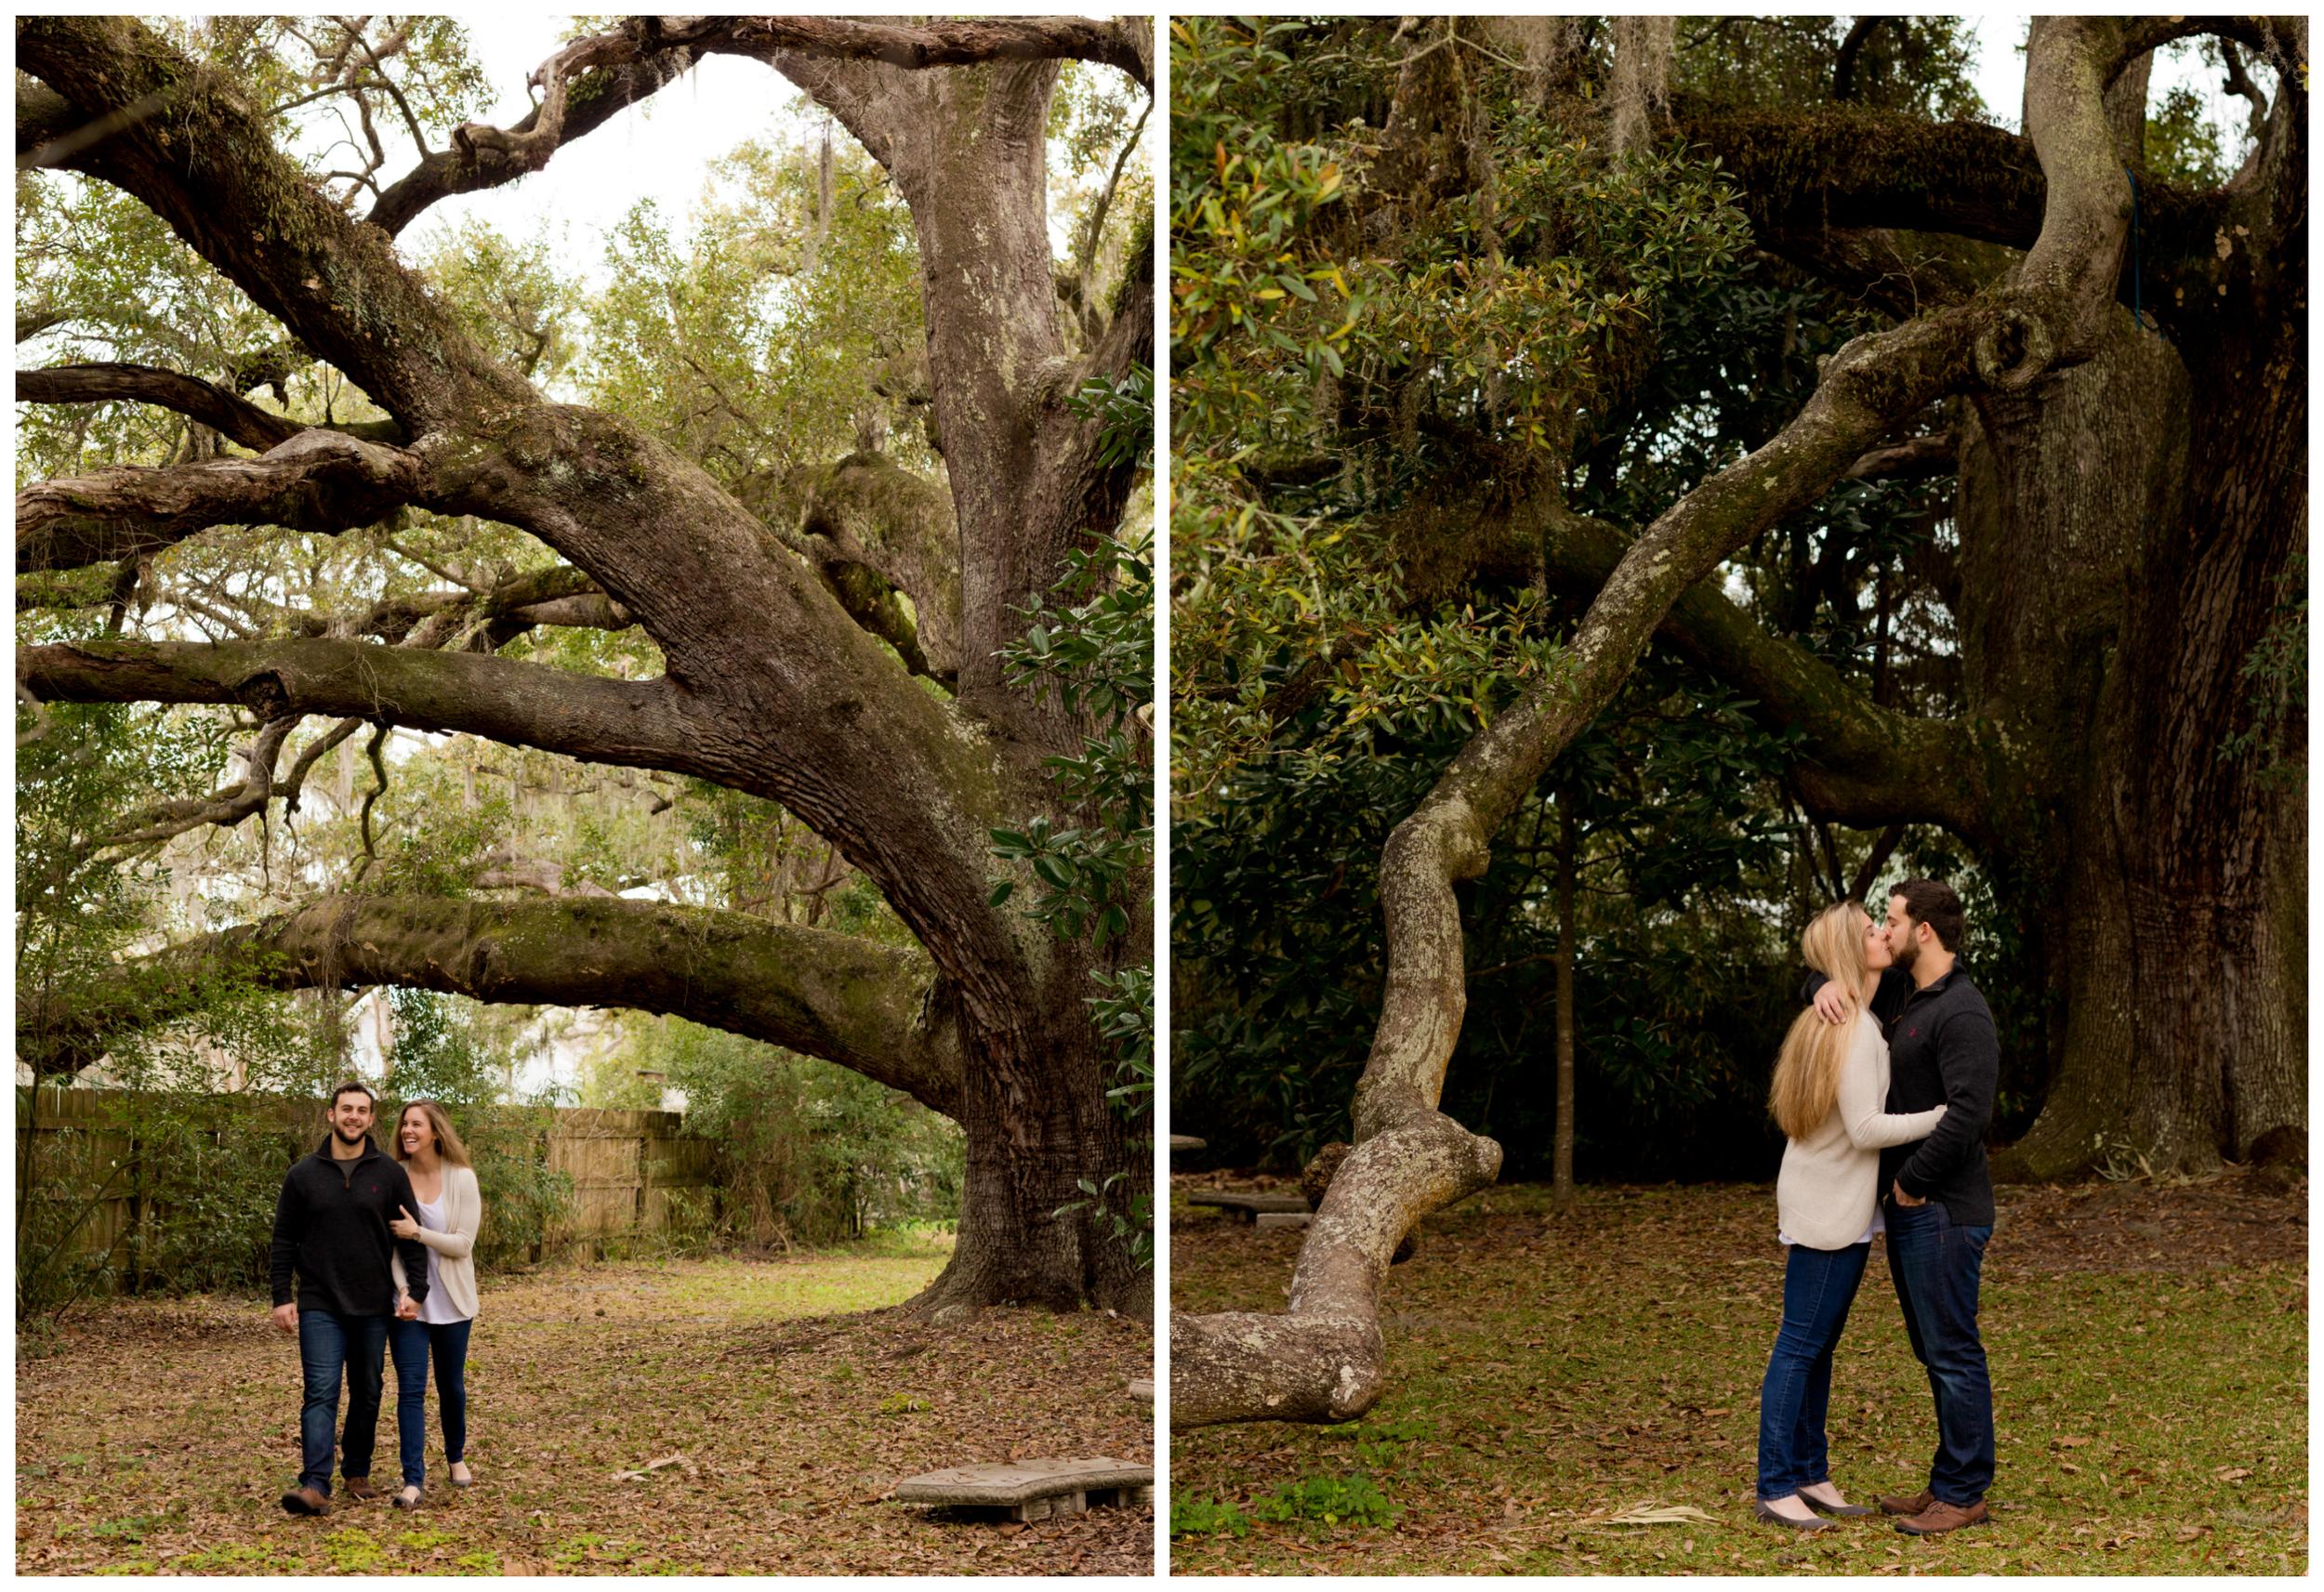 Engagement Photos at Ruskin Oak Tree